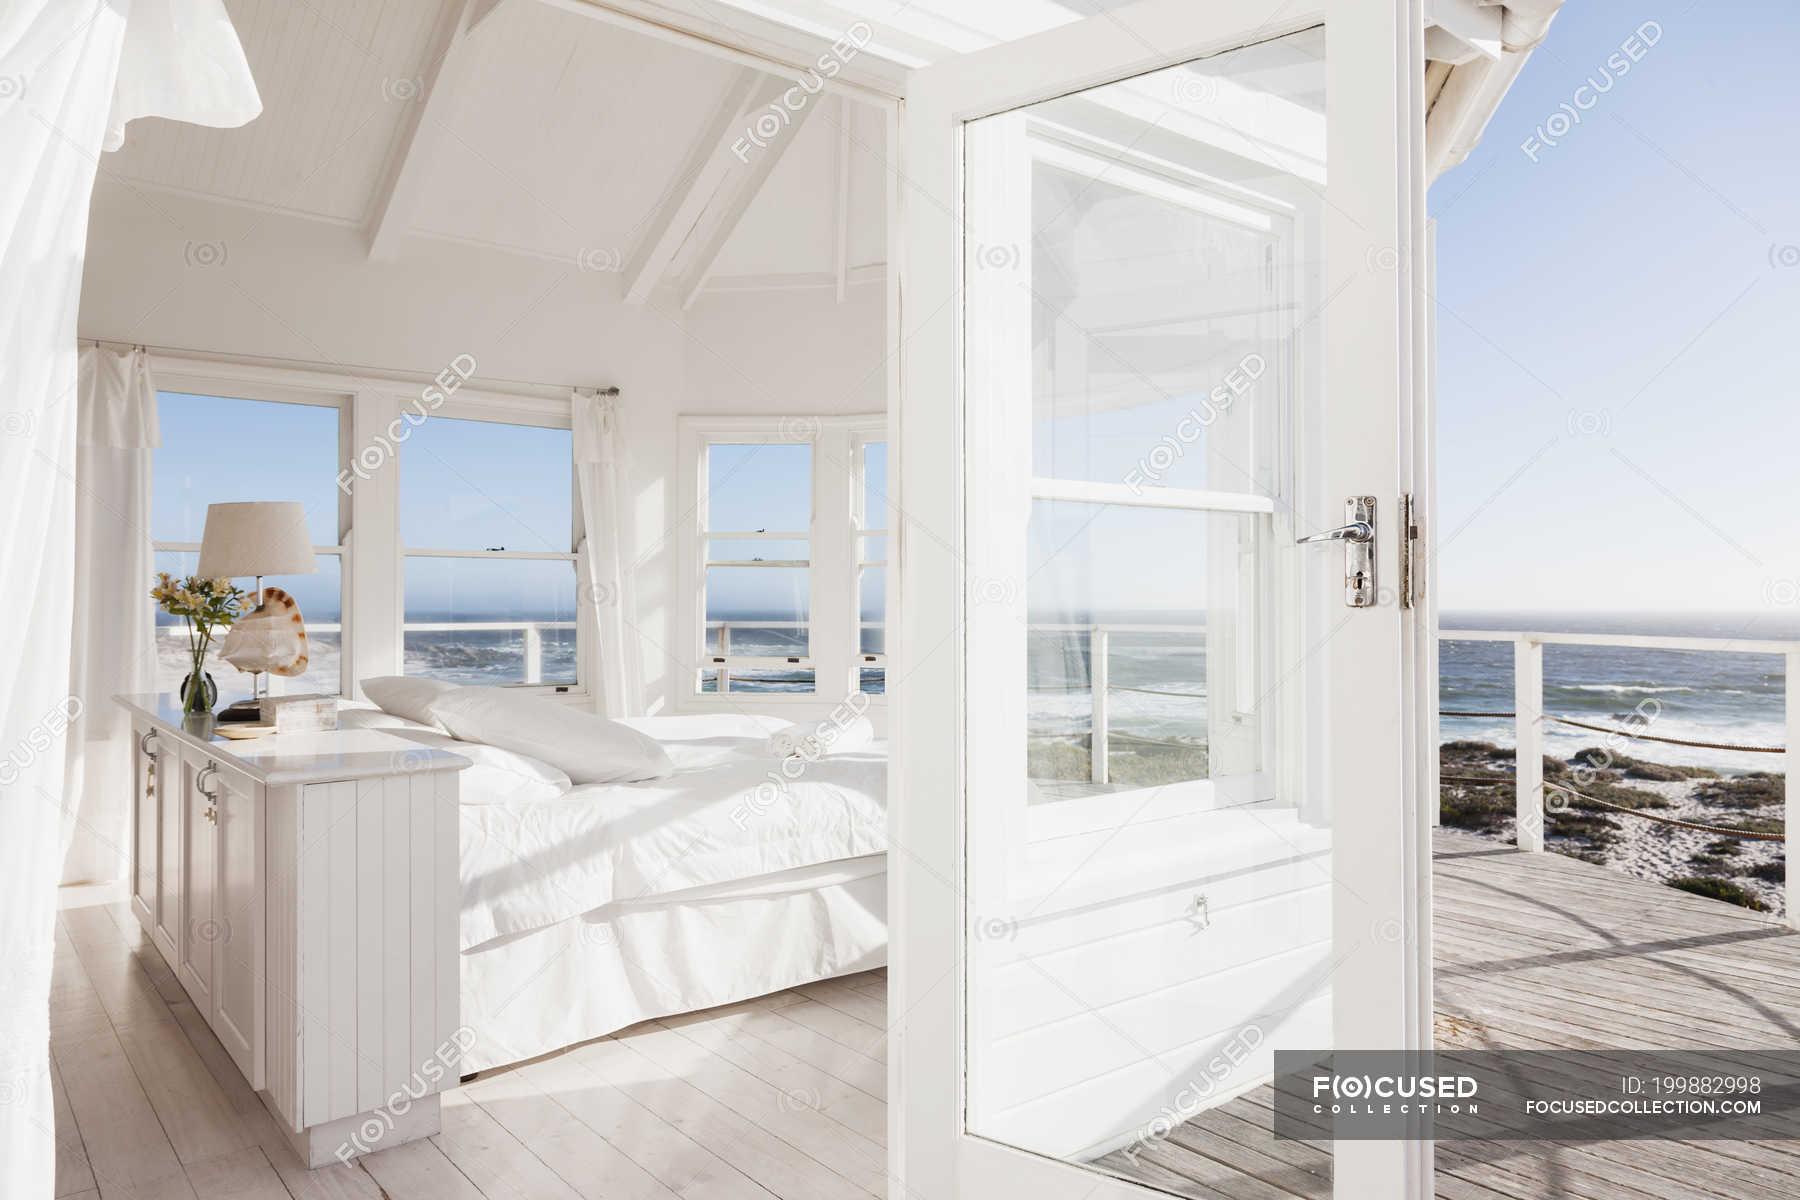 Scenic View Of White Bedroom Overlooking Ocean Absence Luxury Stock Photo 199882998